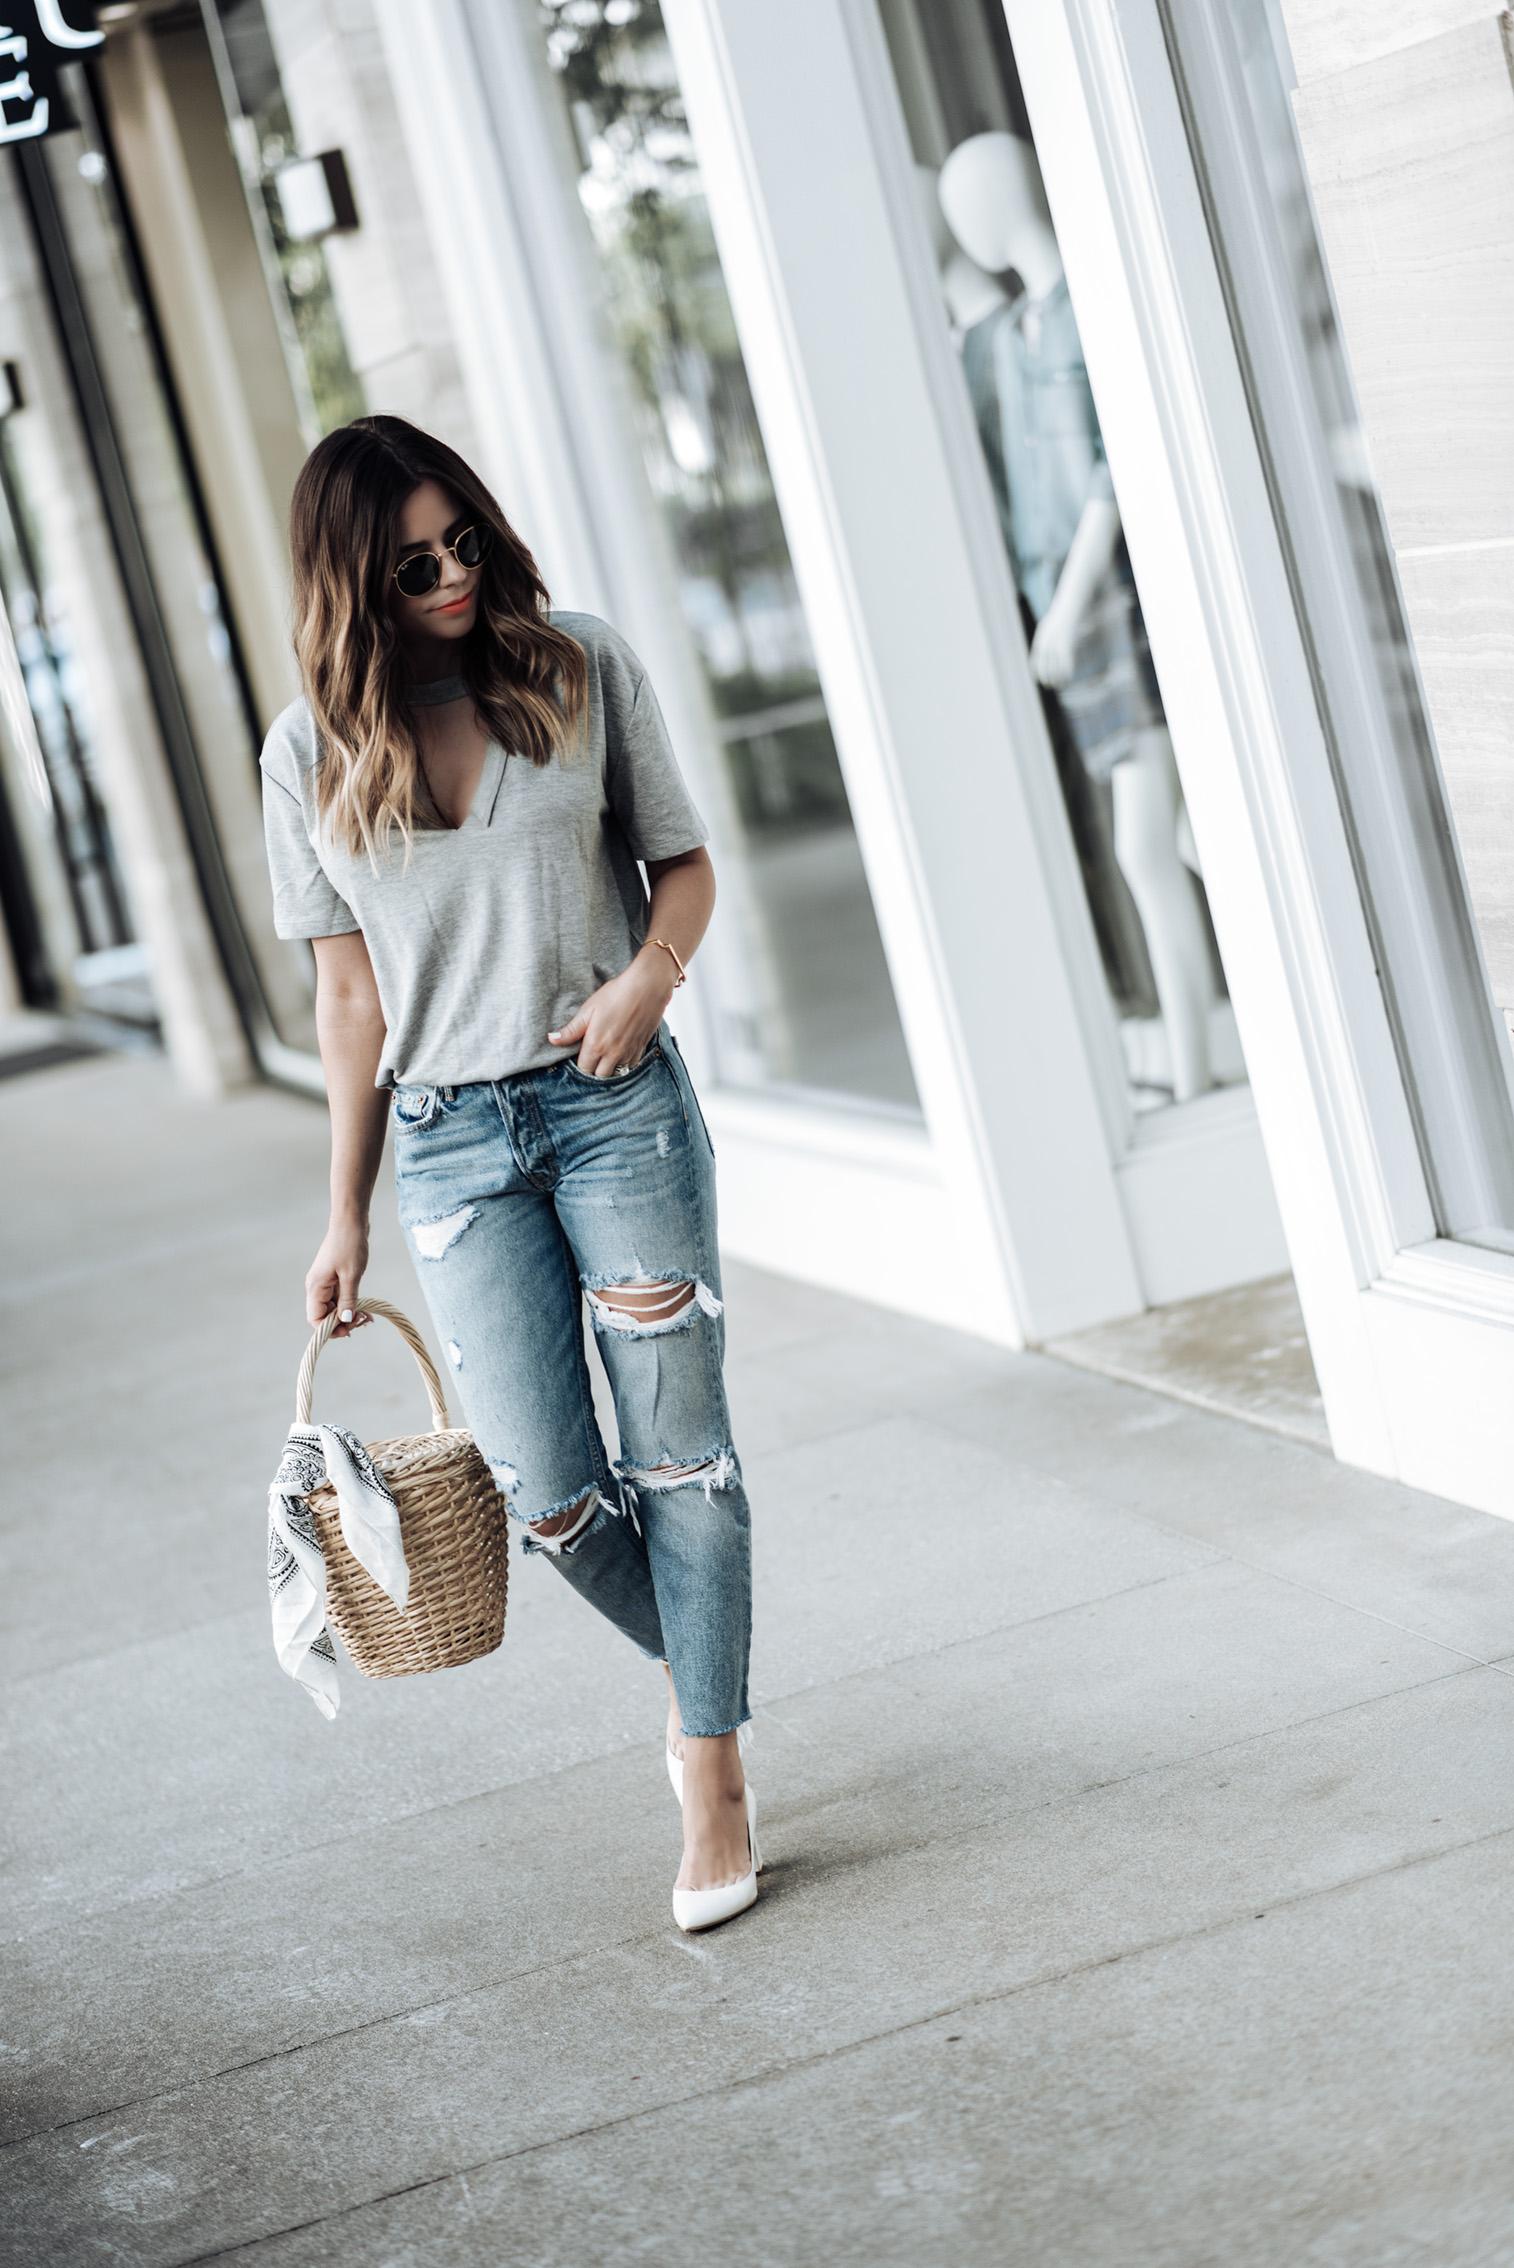 Tiffany Jais Houston fashion and lifestyle blogger | Labor day sales 2017 |